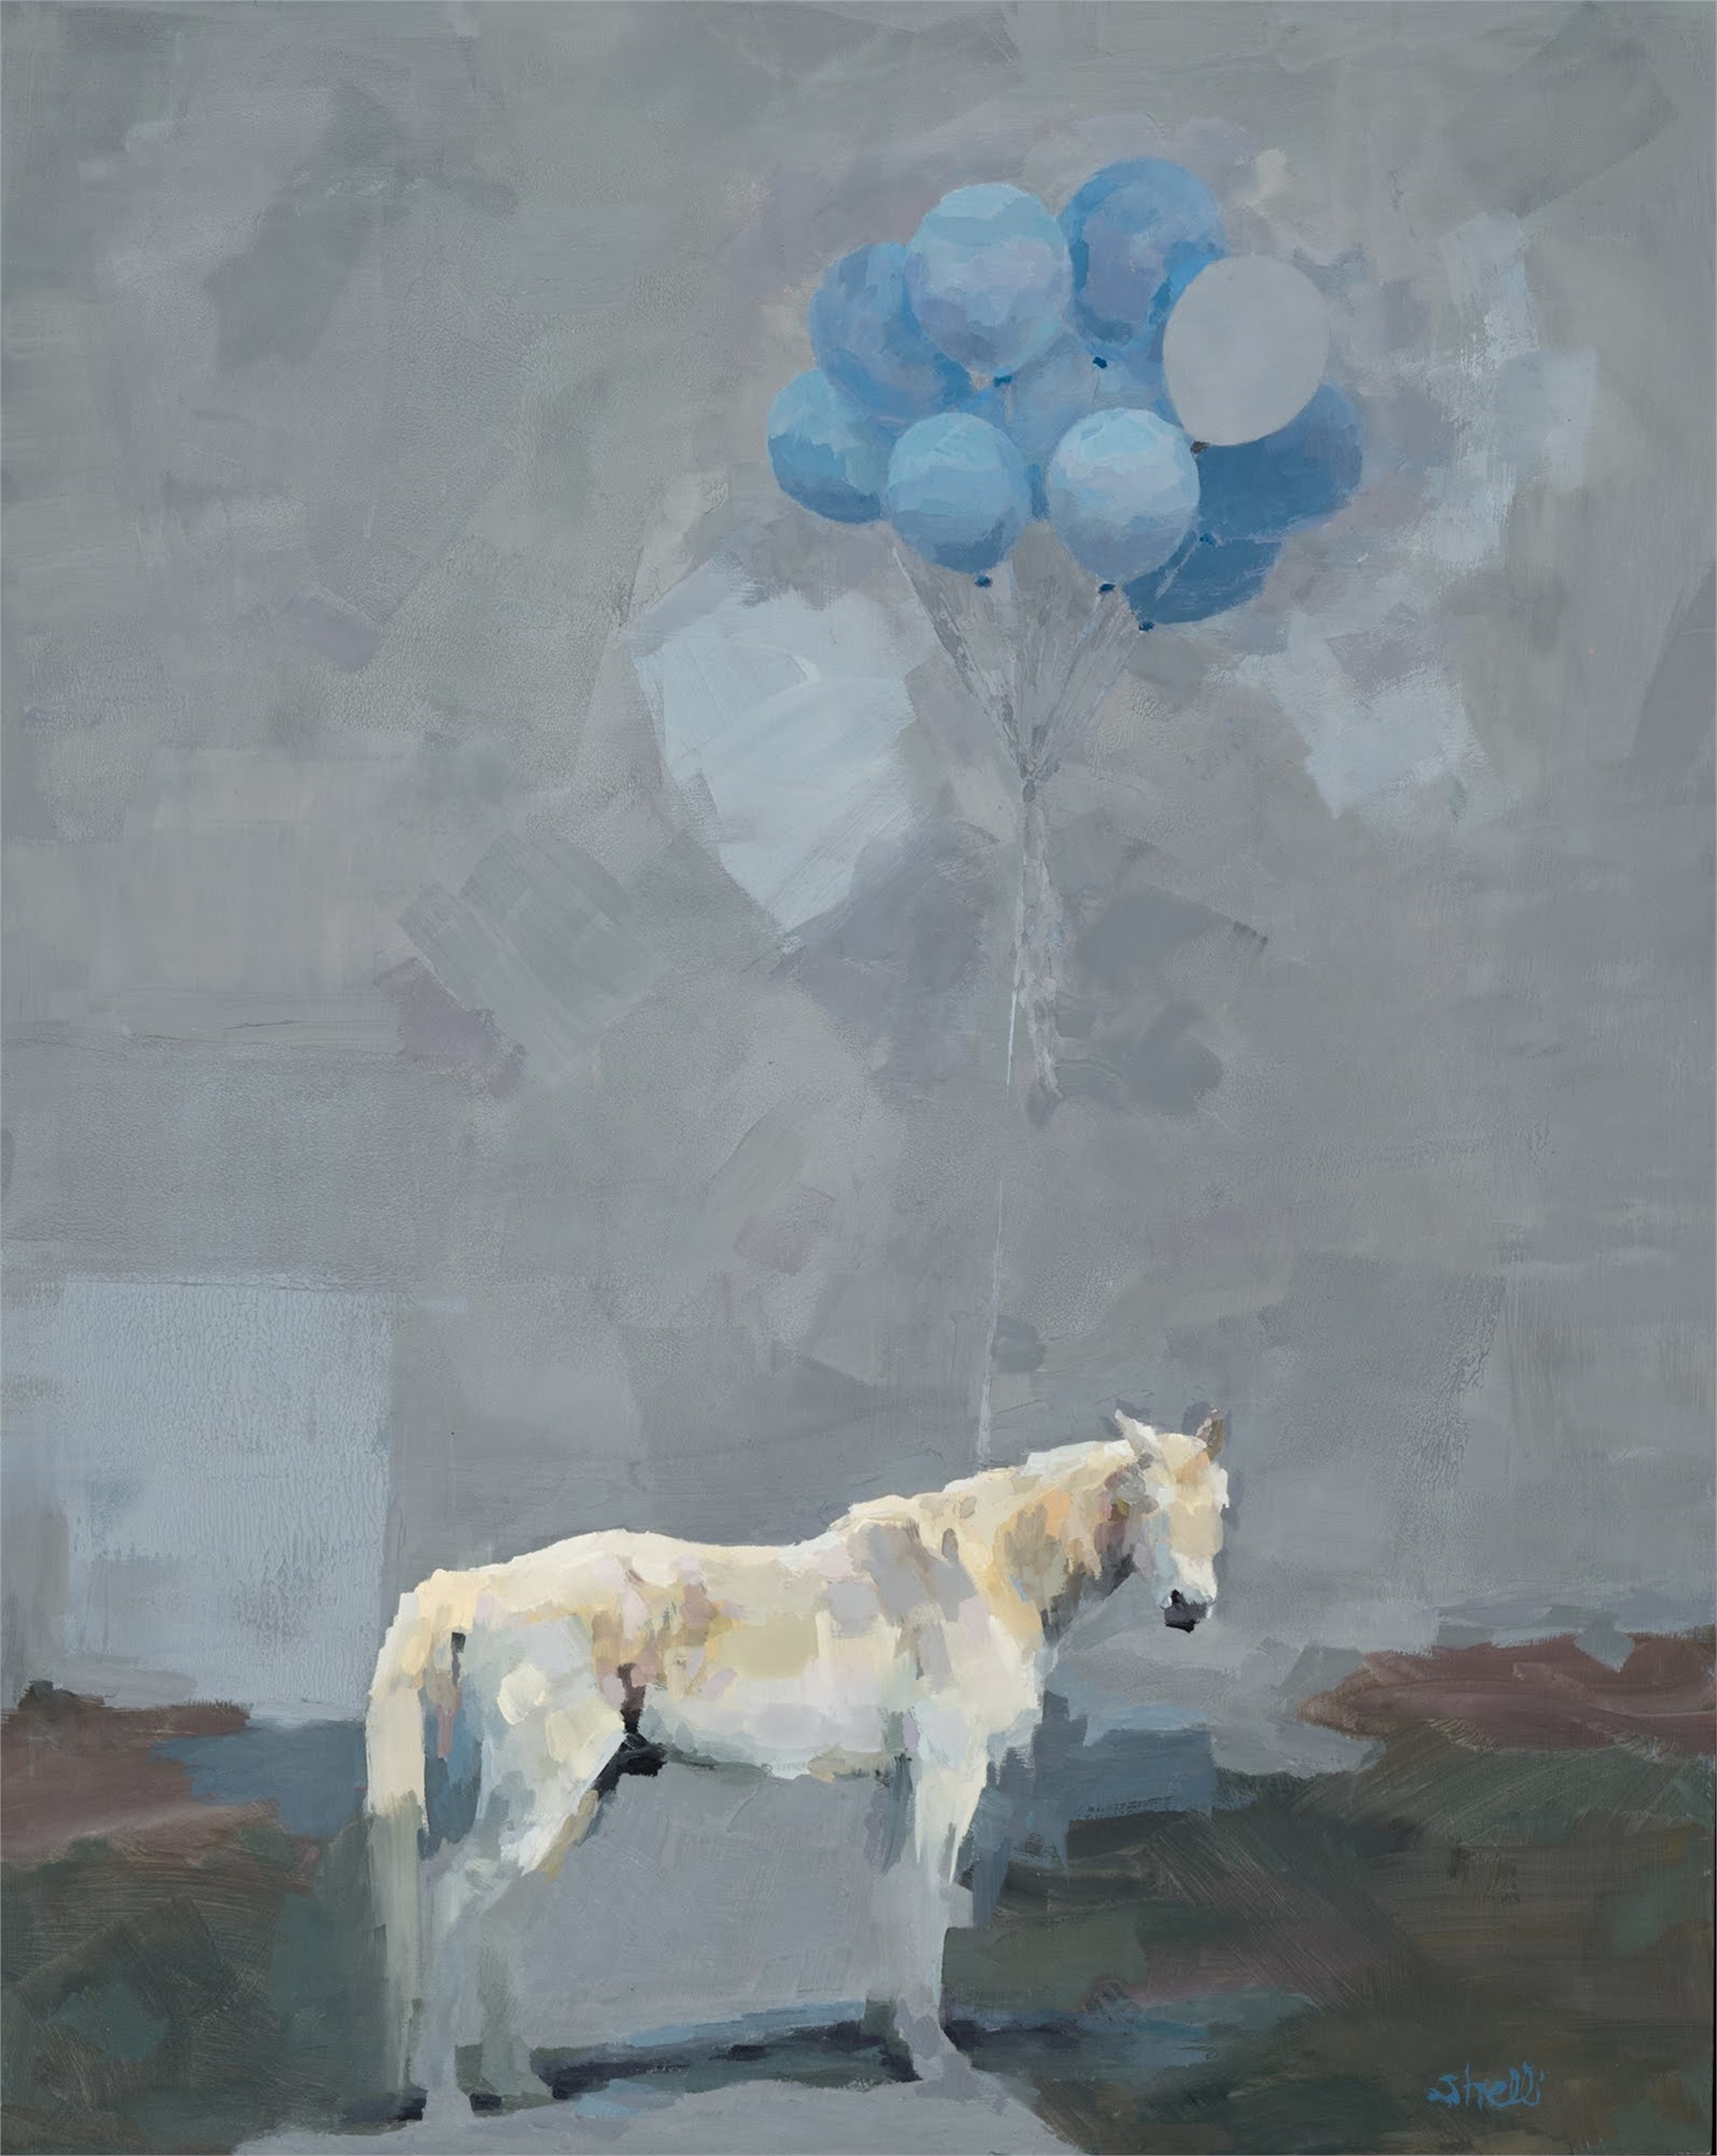 Desolate by Shelli Langdale